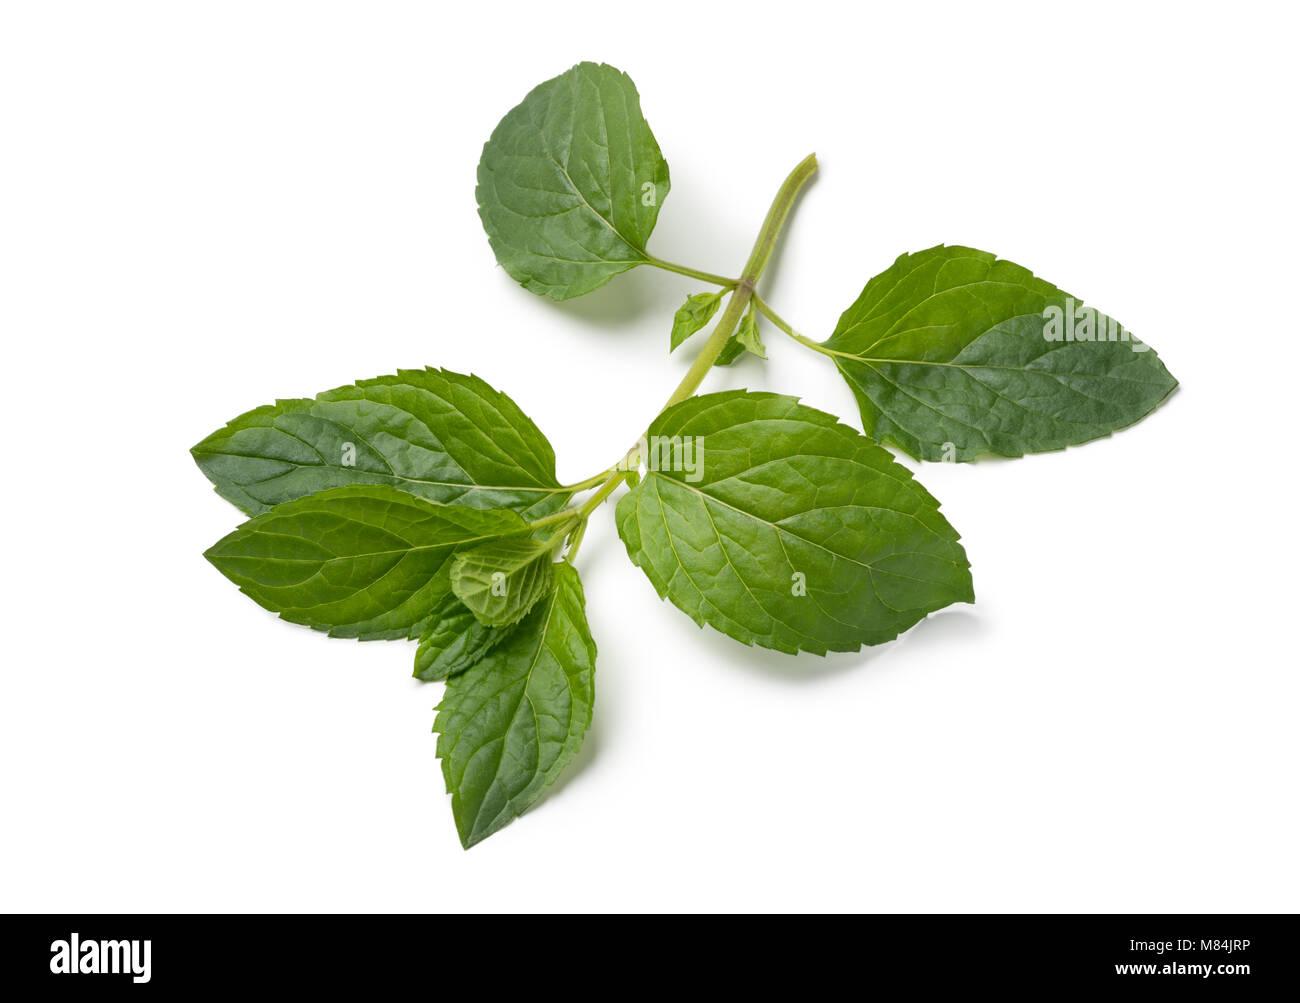 Twig of fresh green chocolat mint isolated on white background - Stock Image